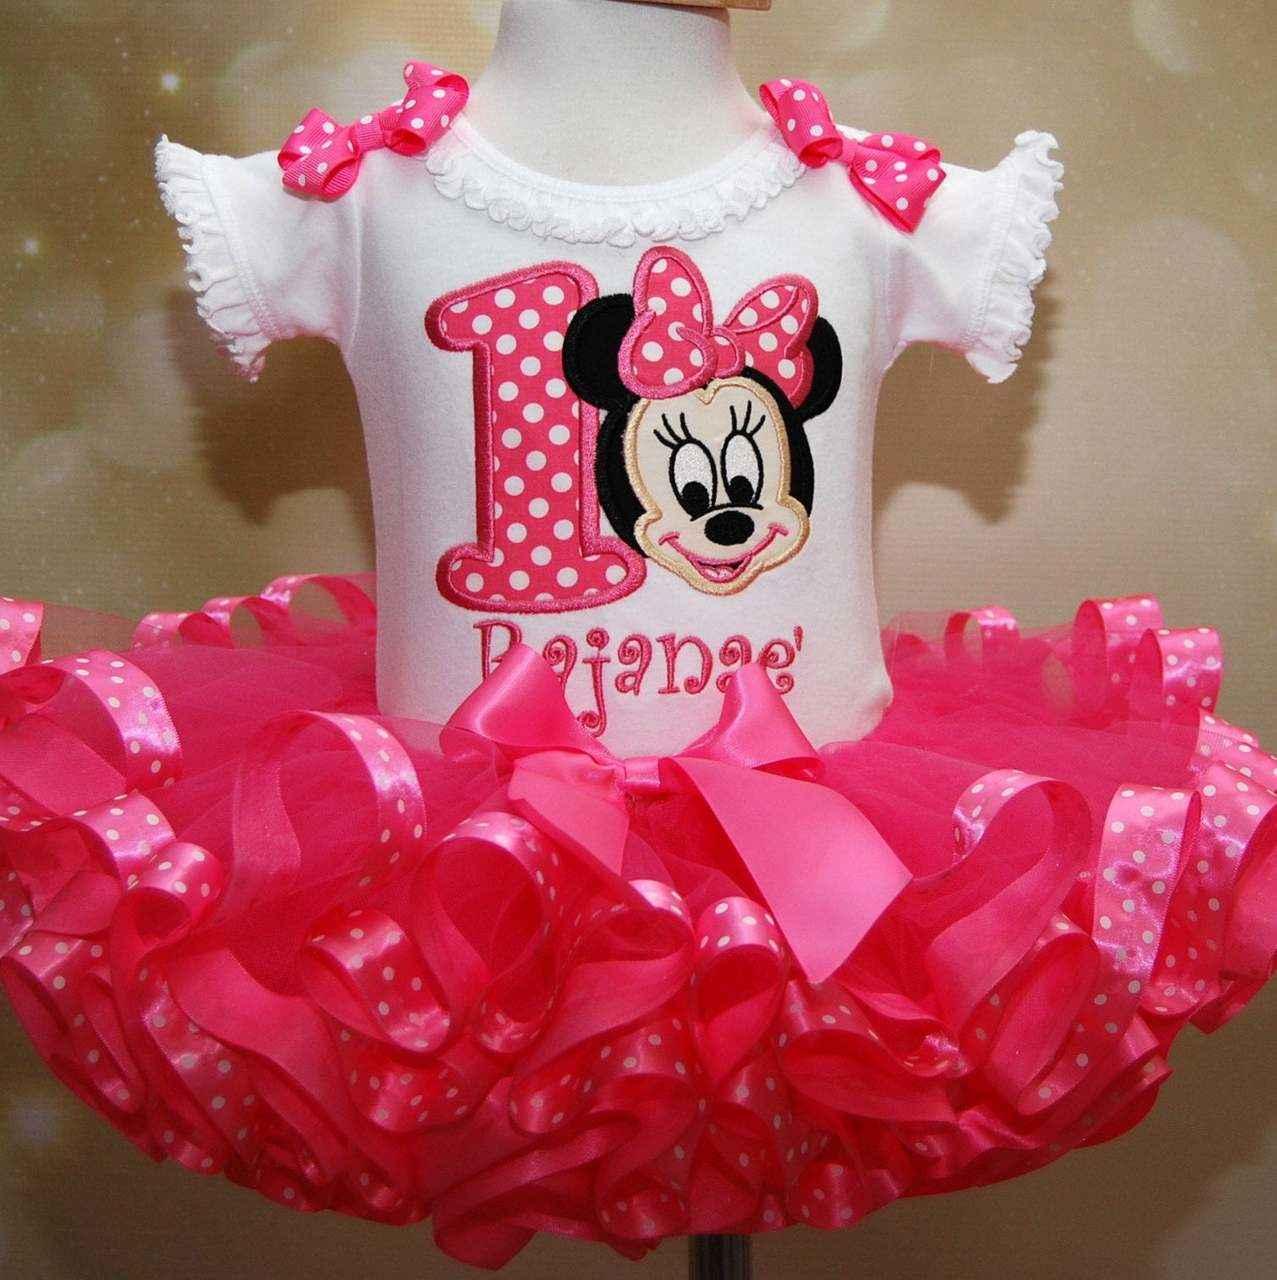 Minnie Mouse birthday outfit, 1st birthday dress Baby Minnie-custom birthday outfits